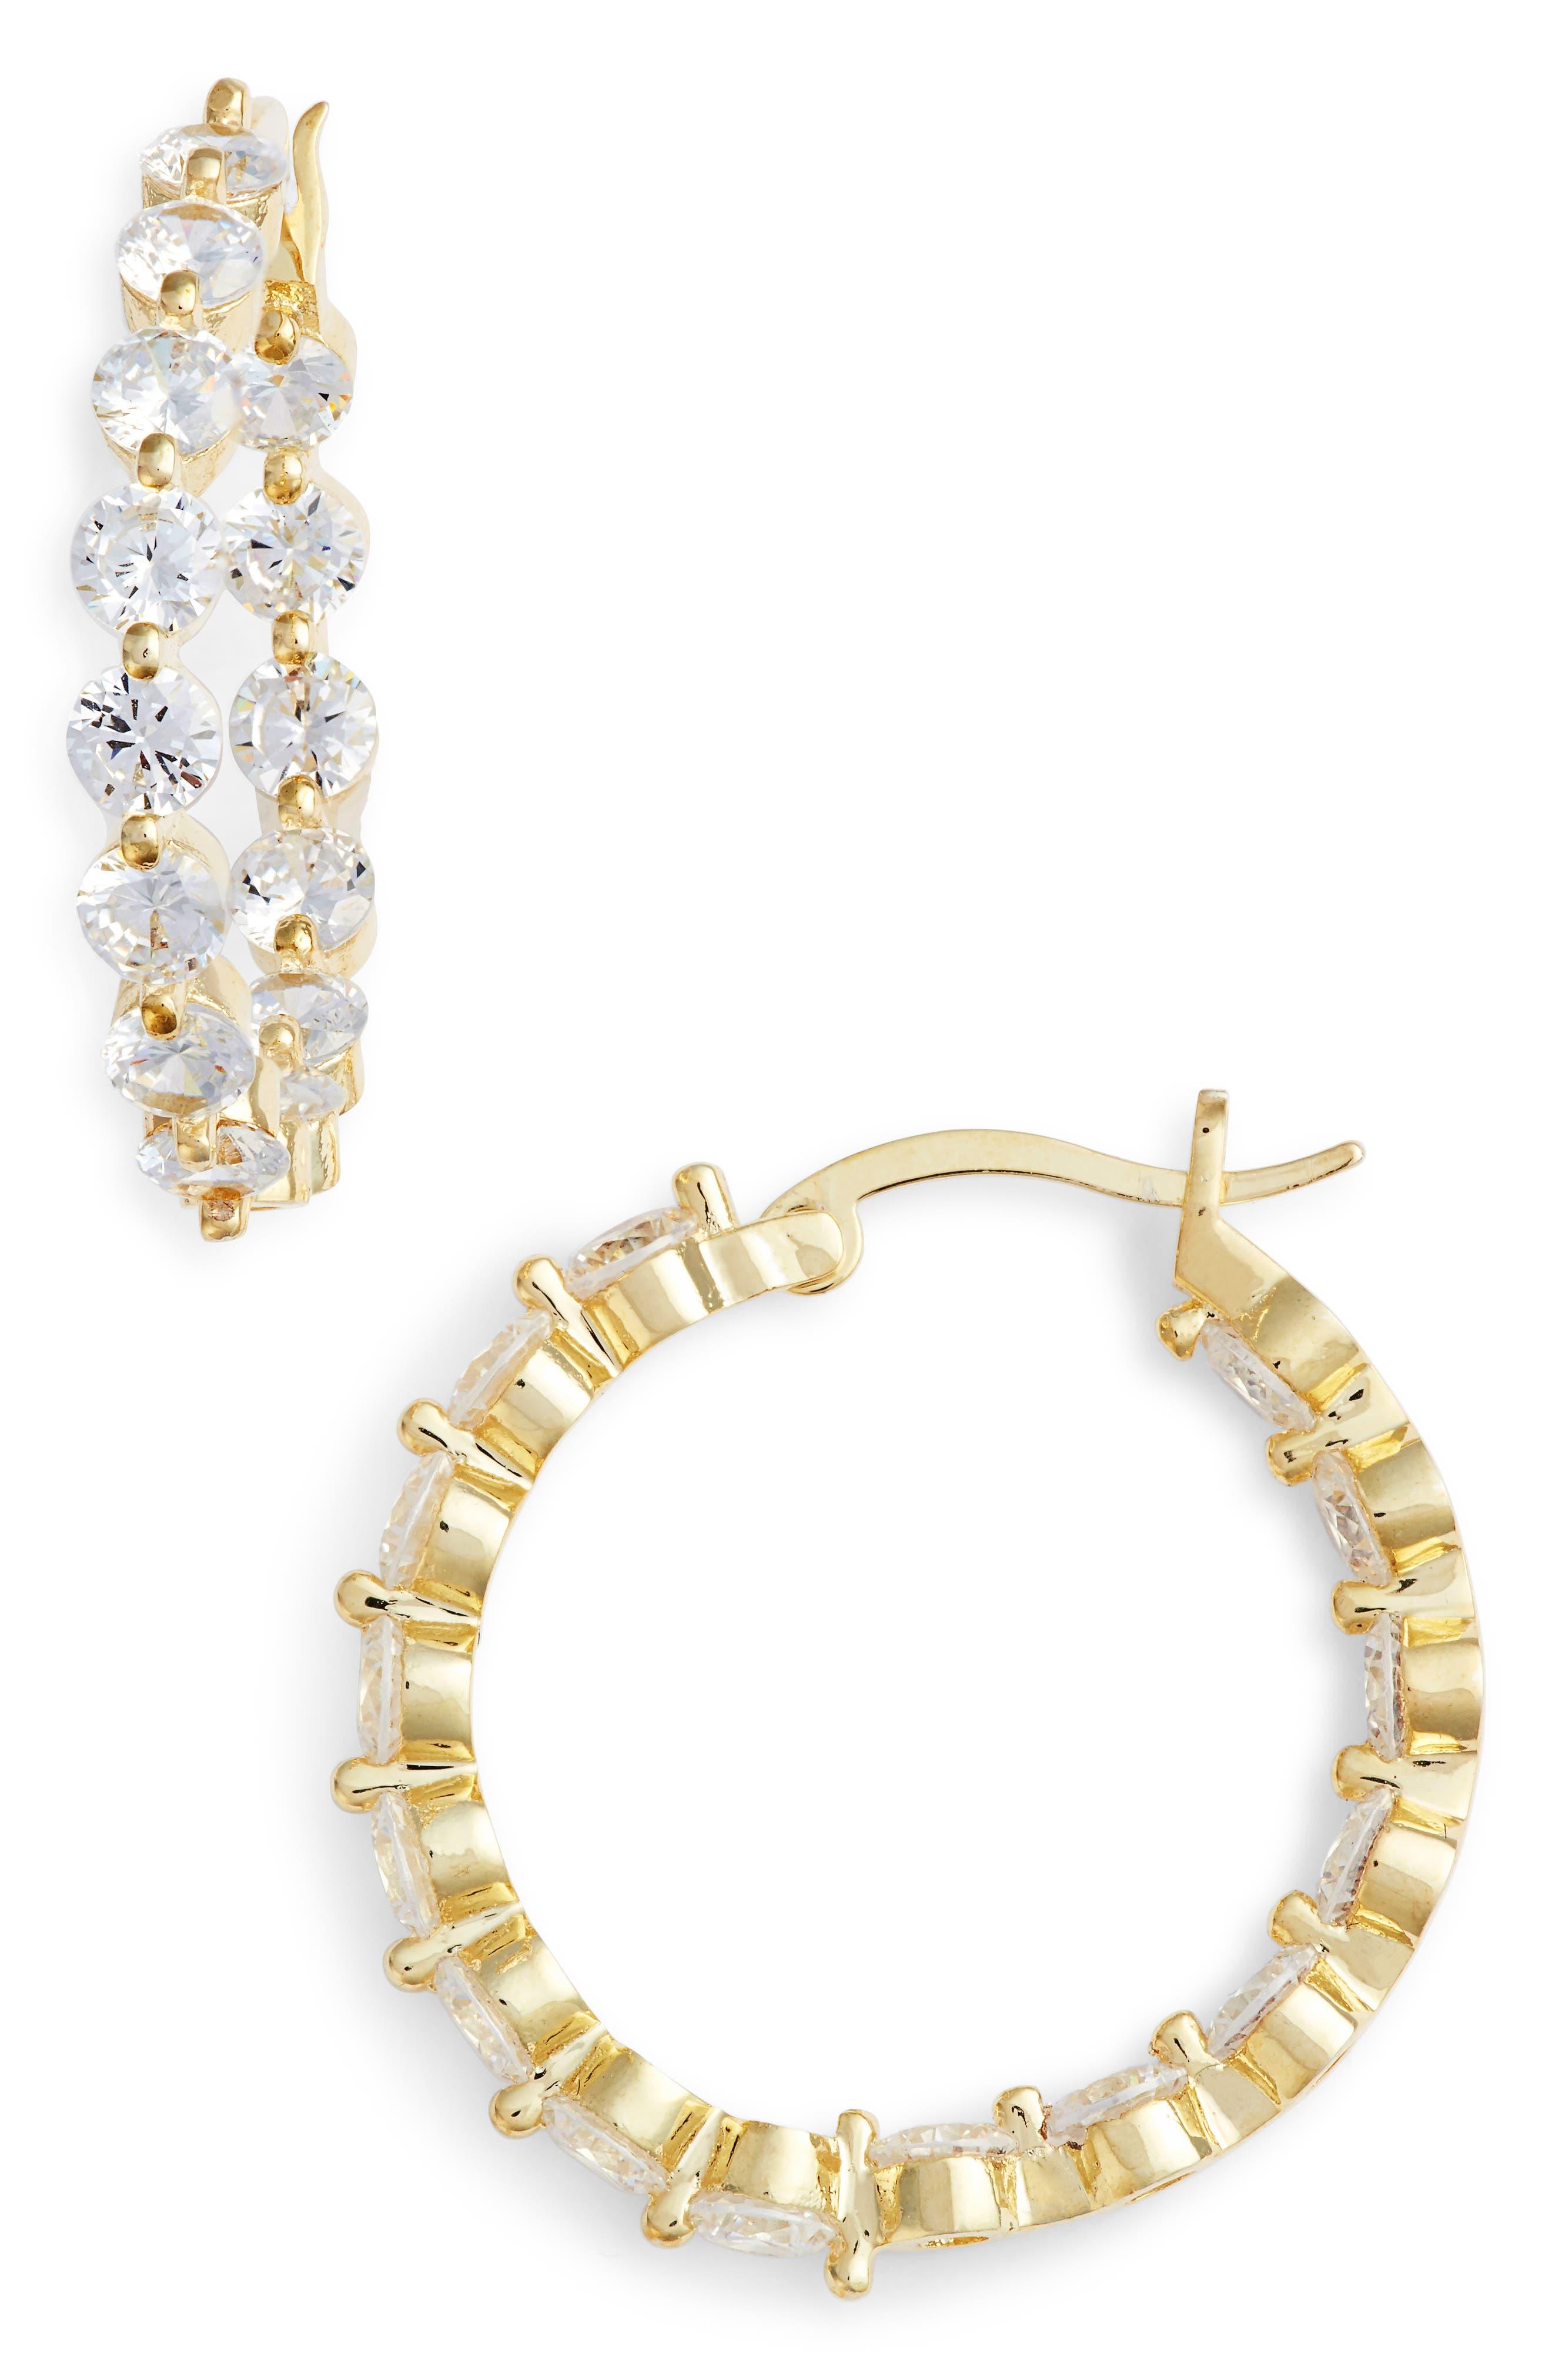 Medium Cubic Zirconia Hoop Earrings,                             Main thumbnail 1, color,                             Gold/ White Cz